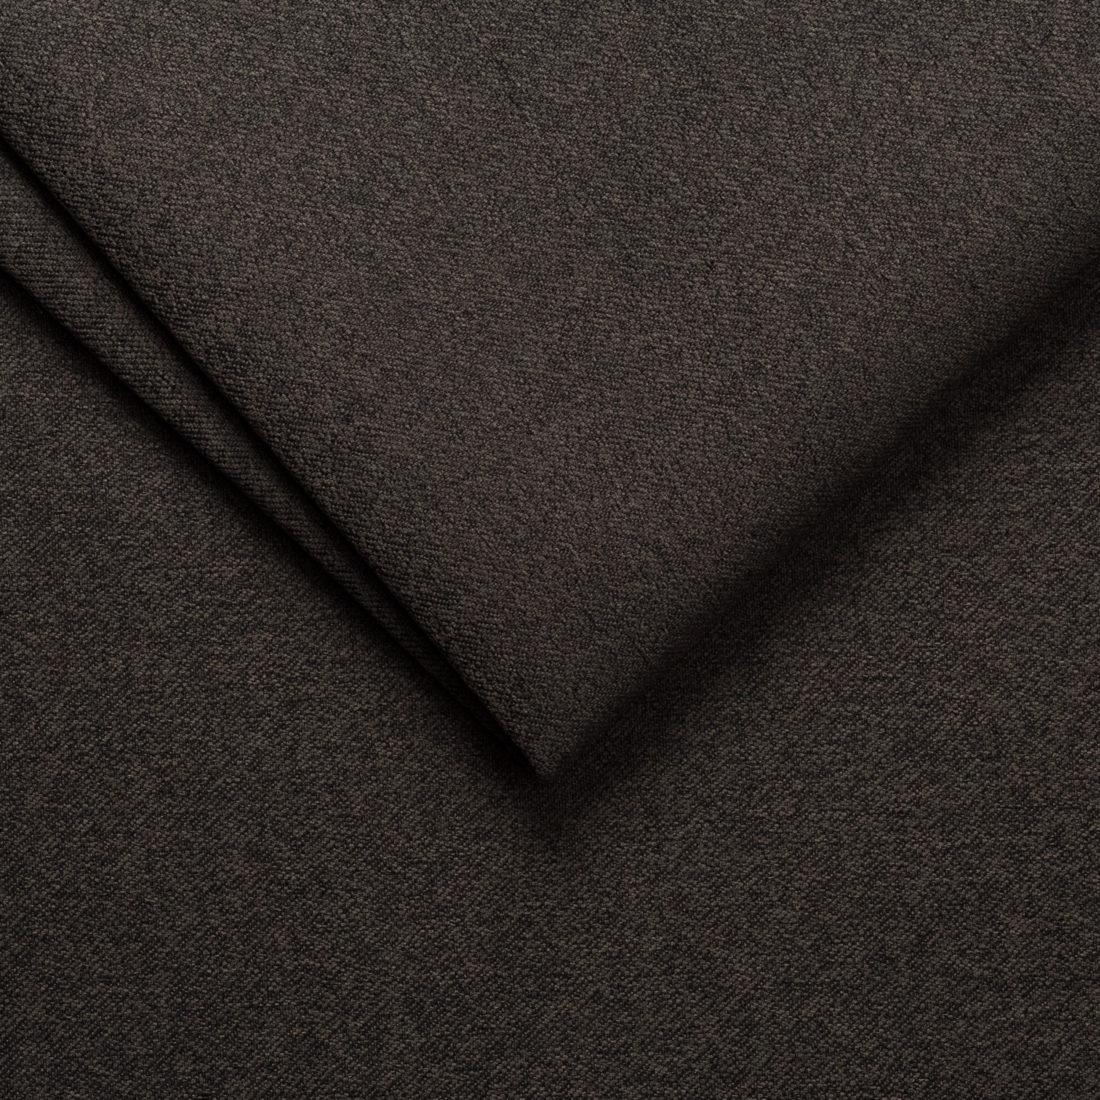 Мебельная ткань Evolution 4 Dark Brown, жаккард